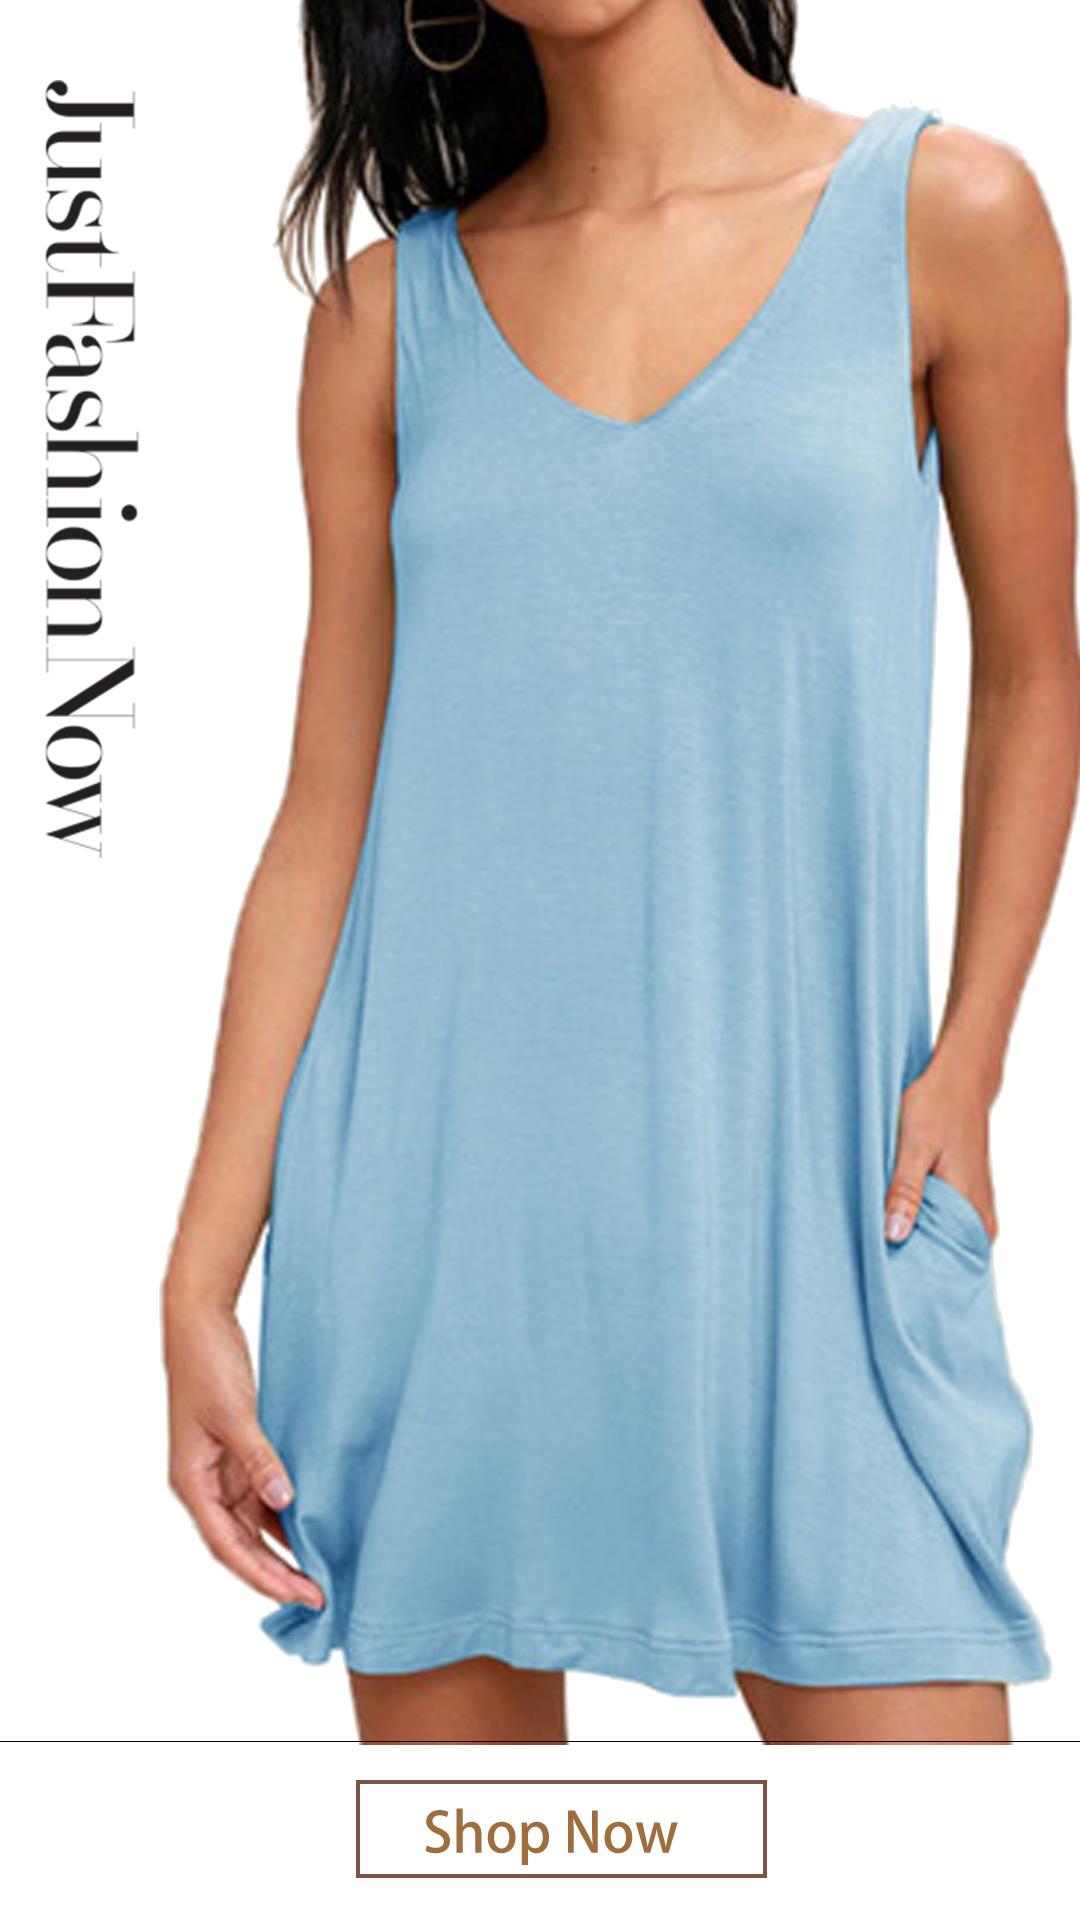 f4e7b00cf1 $16.89 Women Summer Casual T Shirt Dresses Beach Cover up Plain Pleated  Tank Dress